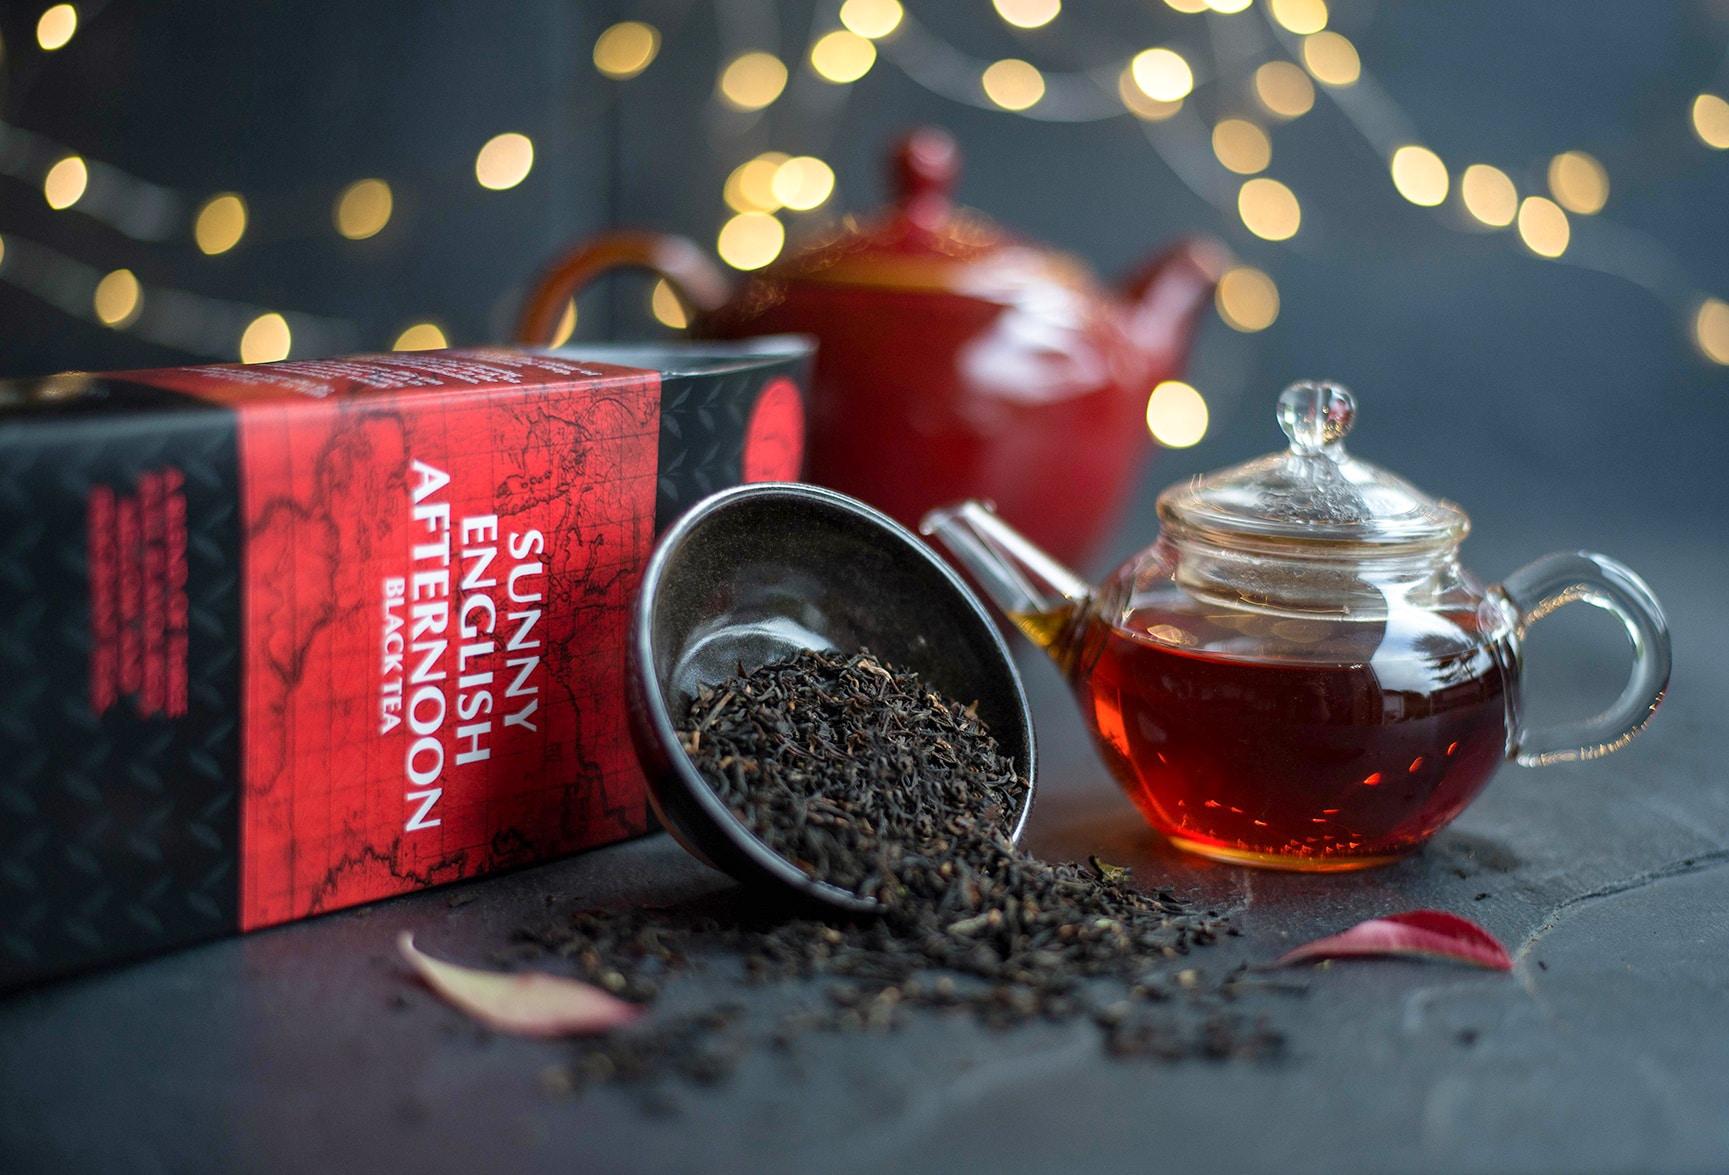 English Afternoon black tea blends